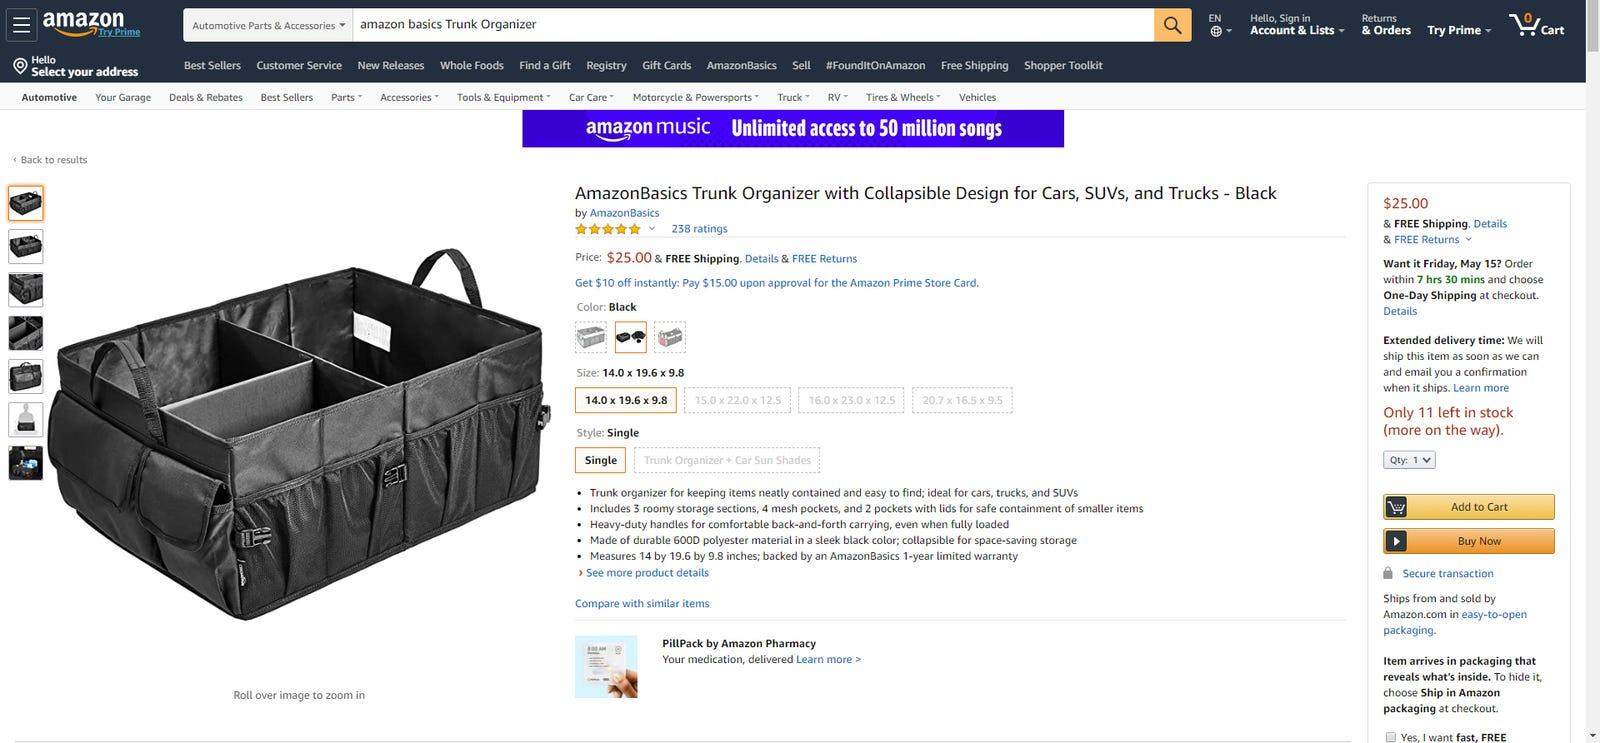 Amazon's own car trunk organizer.